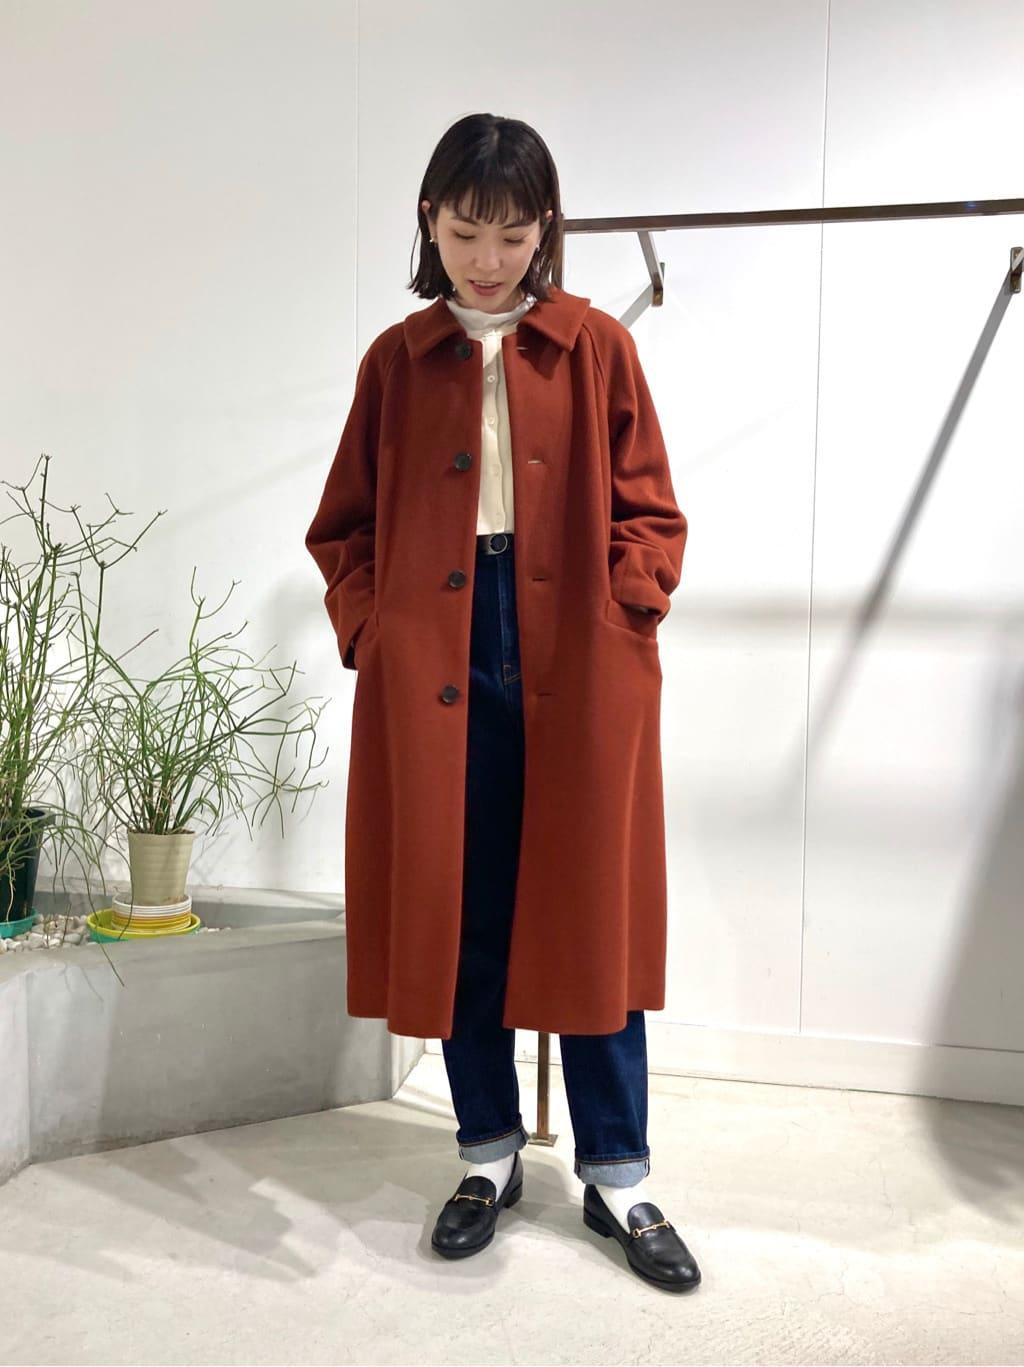 l'atelier du savon 名古屋栄路面 身長:161cm 2021.10.16